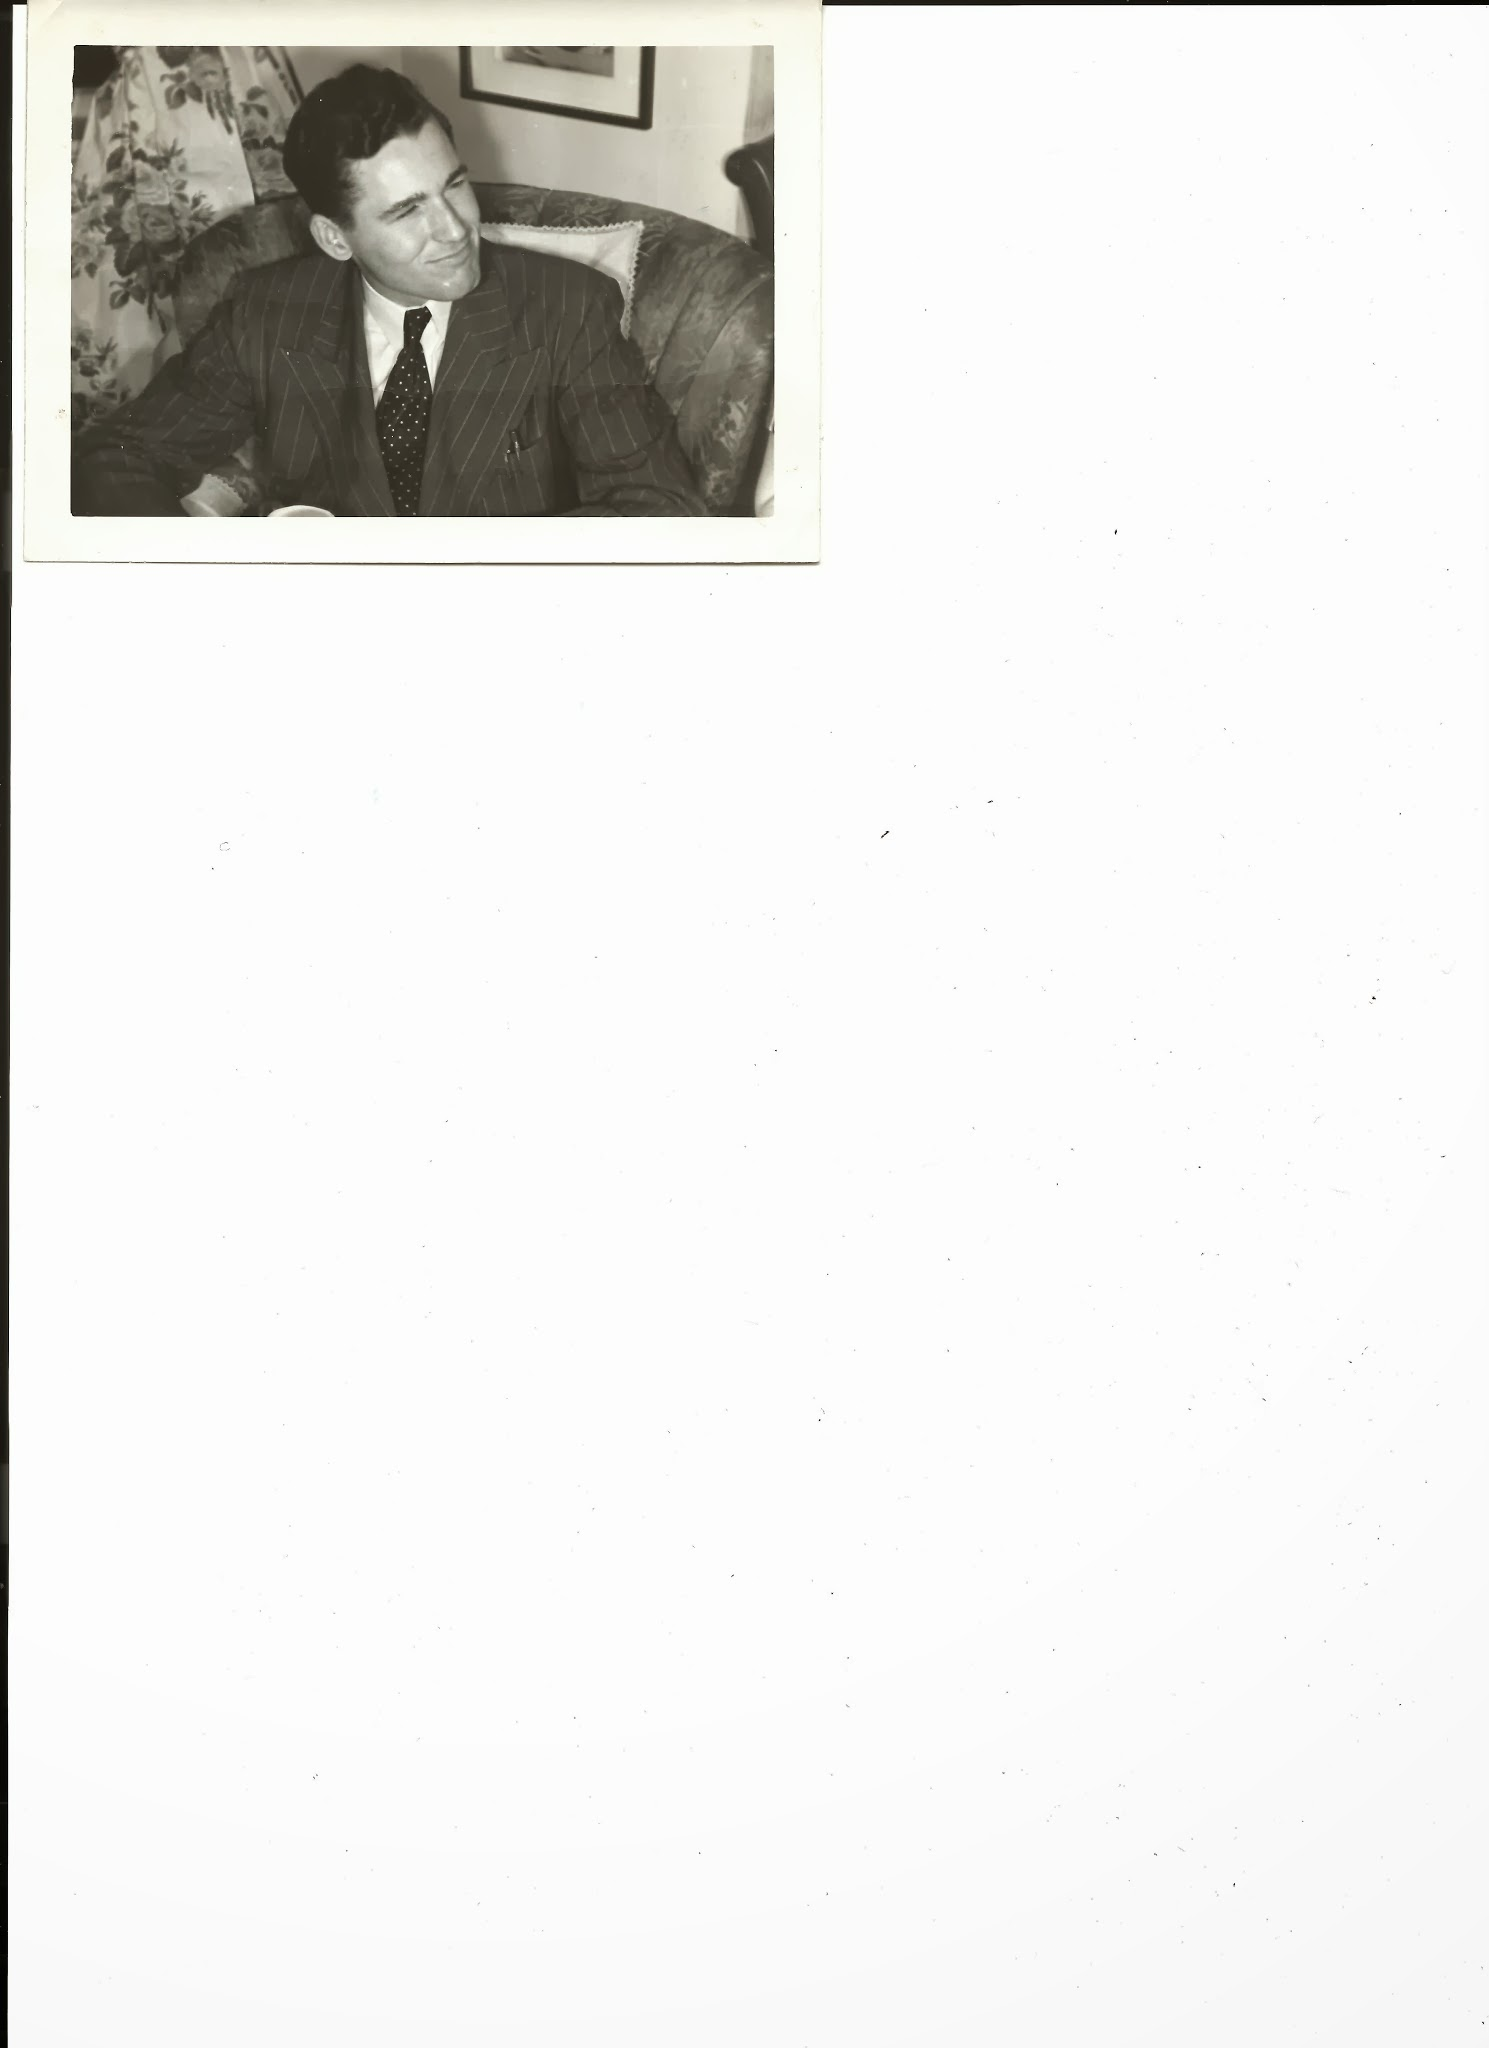 Kevin Murphy, 1955